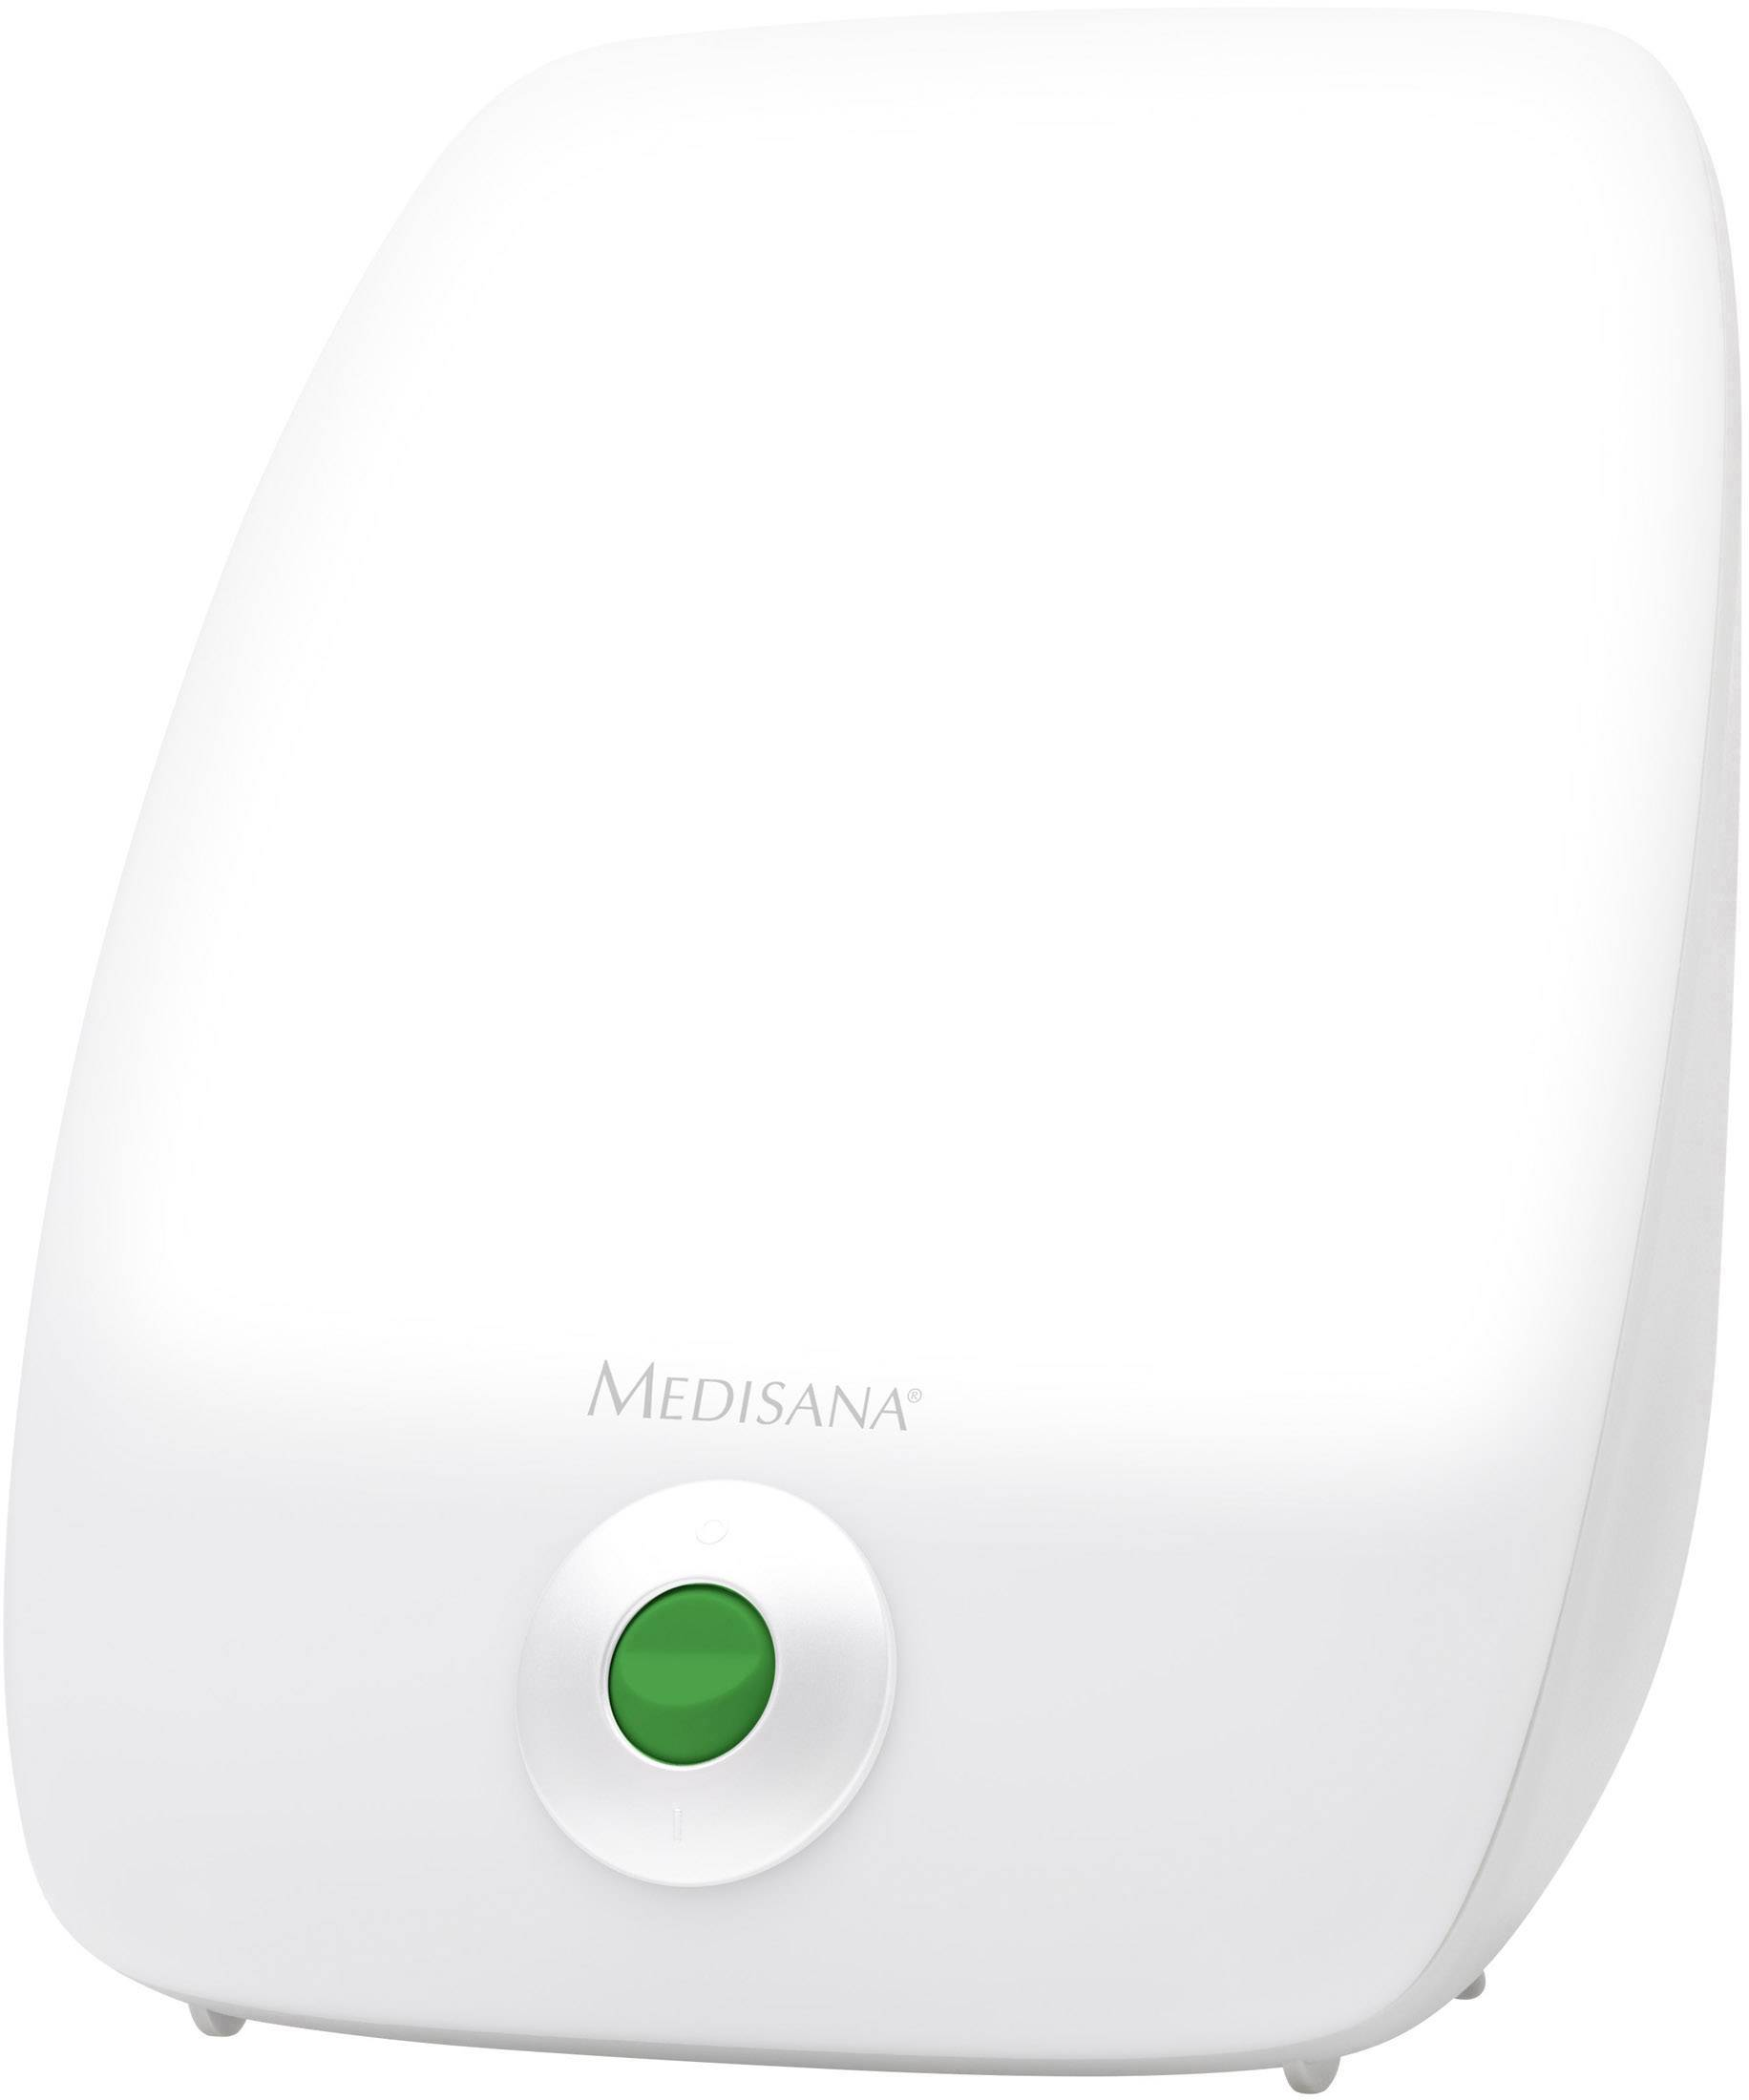 Lampa denného svetla Medisana LT470, 45 W, biela